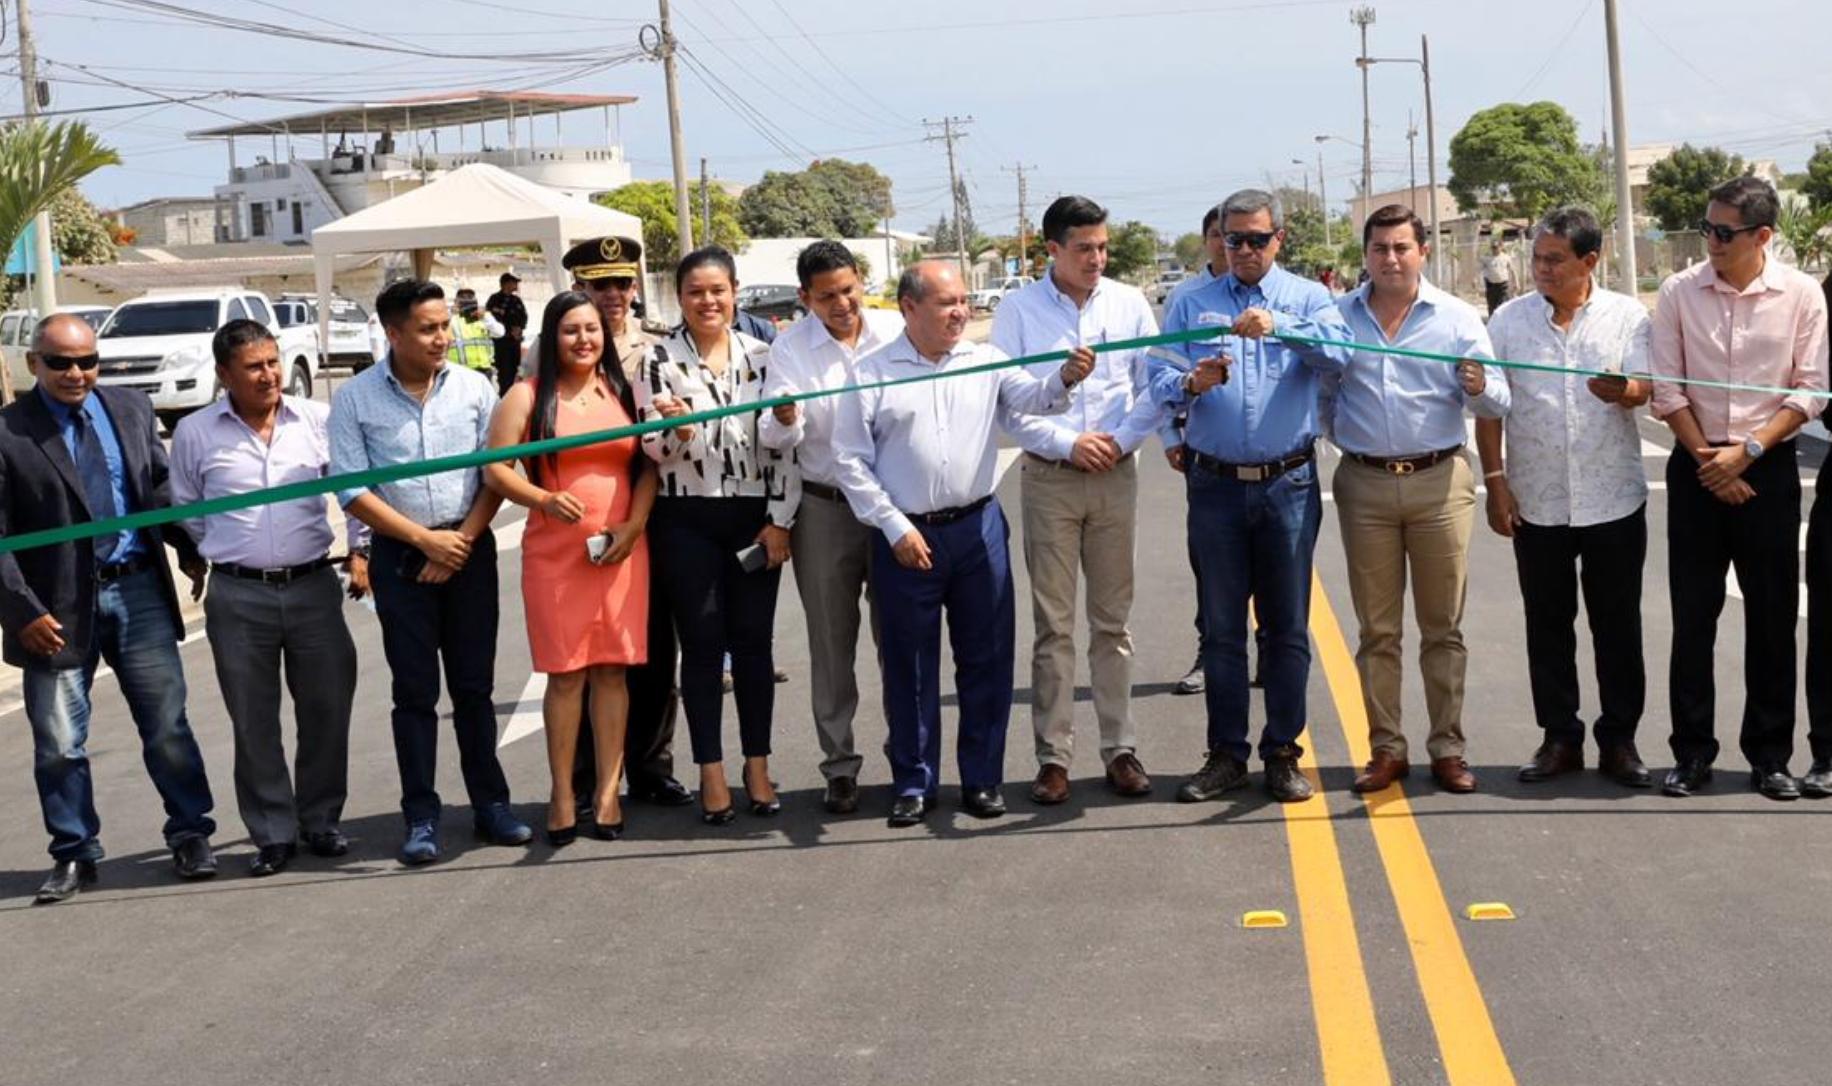 EP Petroecuador invirtió cerca de USD 2 millones en 3.2 kilómetros de asfaltado en dos barrios de La Libertad, Santa Elena